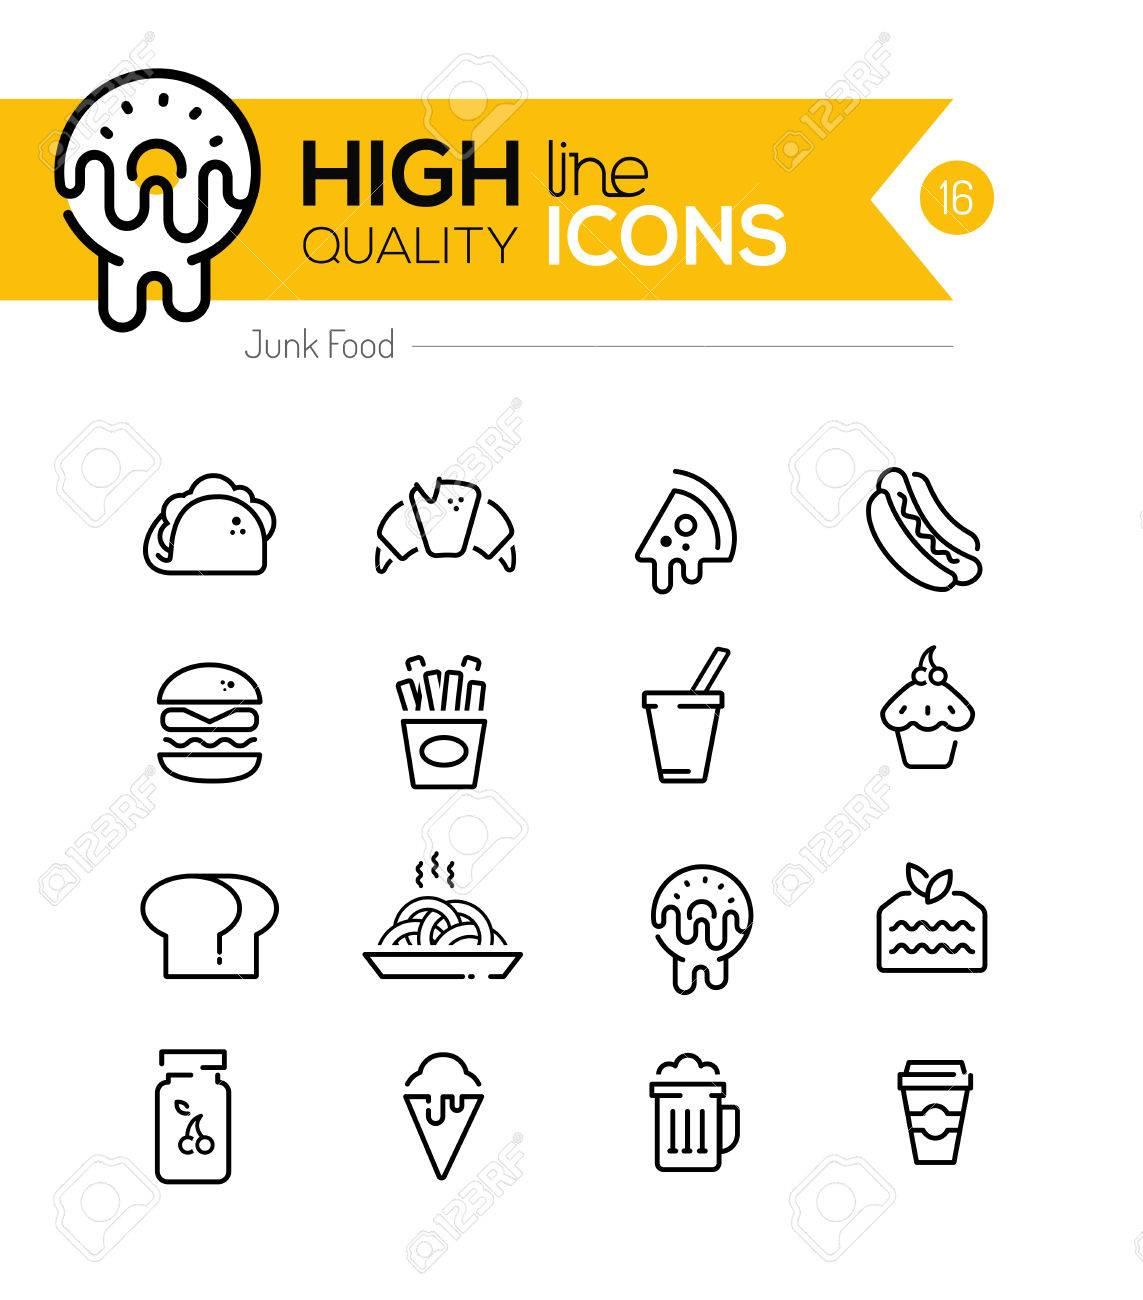 Junk Food Line Icons including: fast food, sugar, alcohol etc.. - 39090518